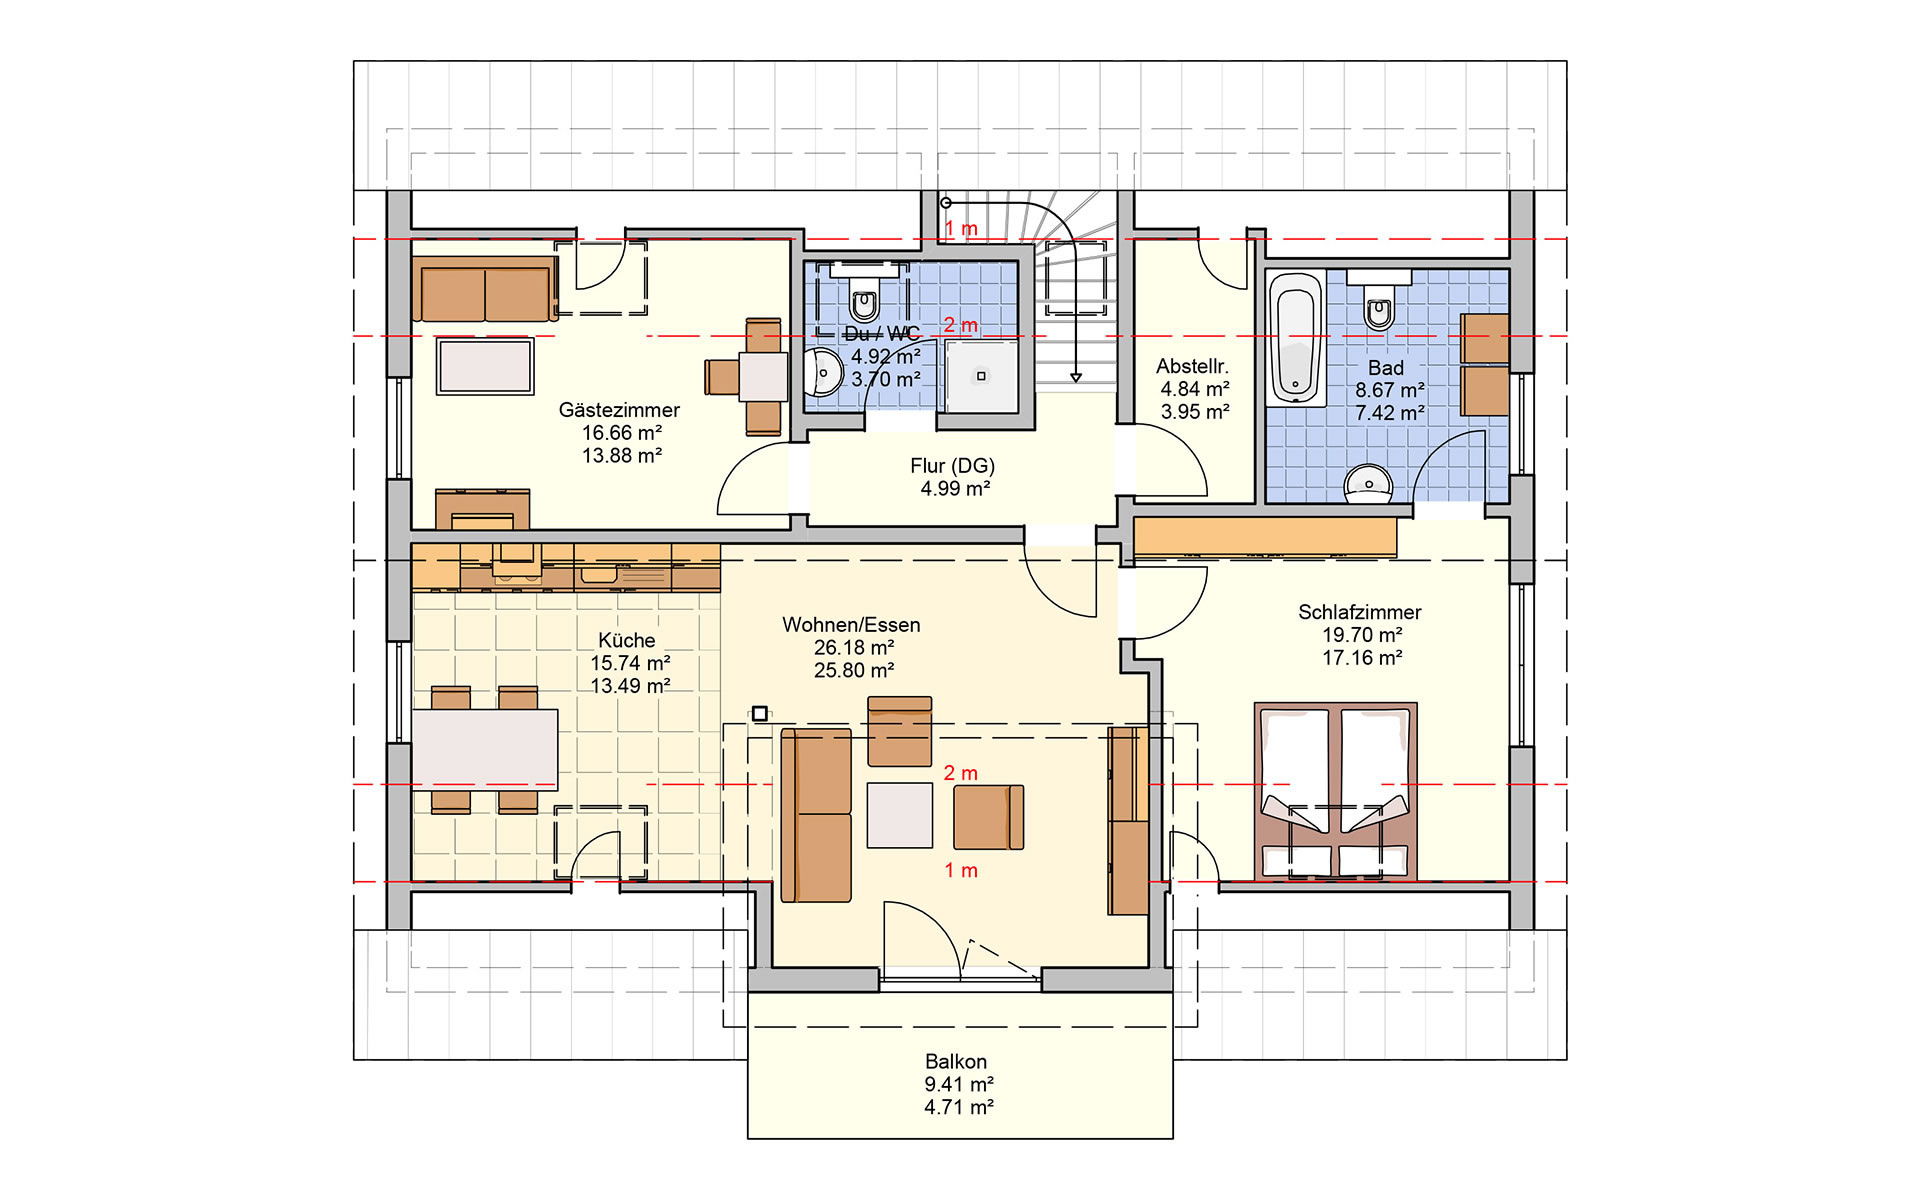 Dachgeschoss Bonvenon von Fingerhut Haus GmbH & Co. KG